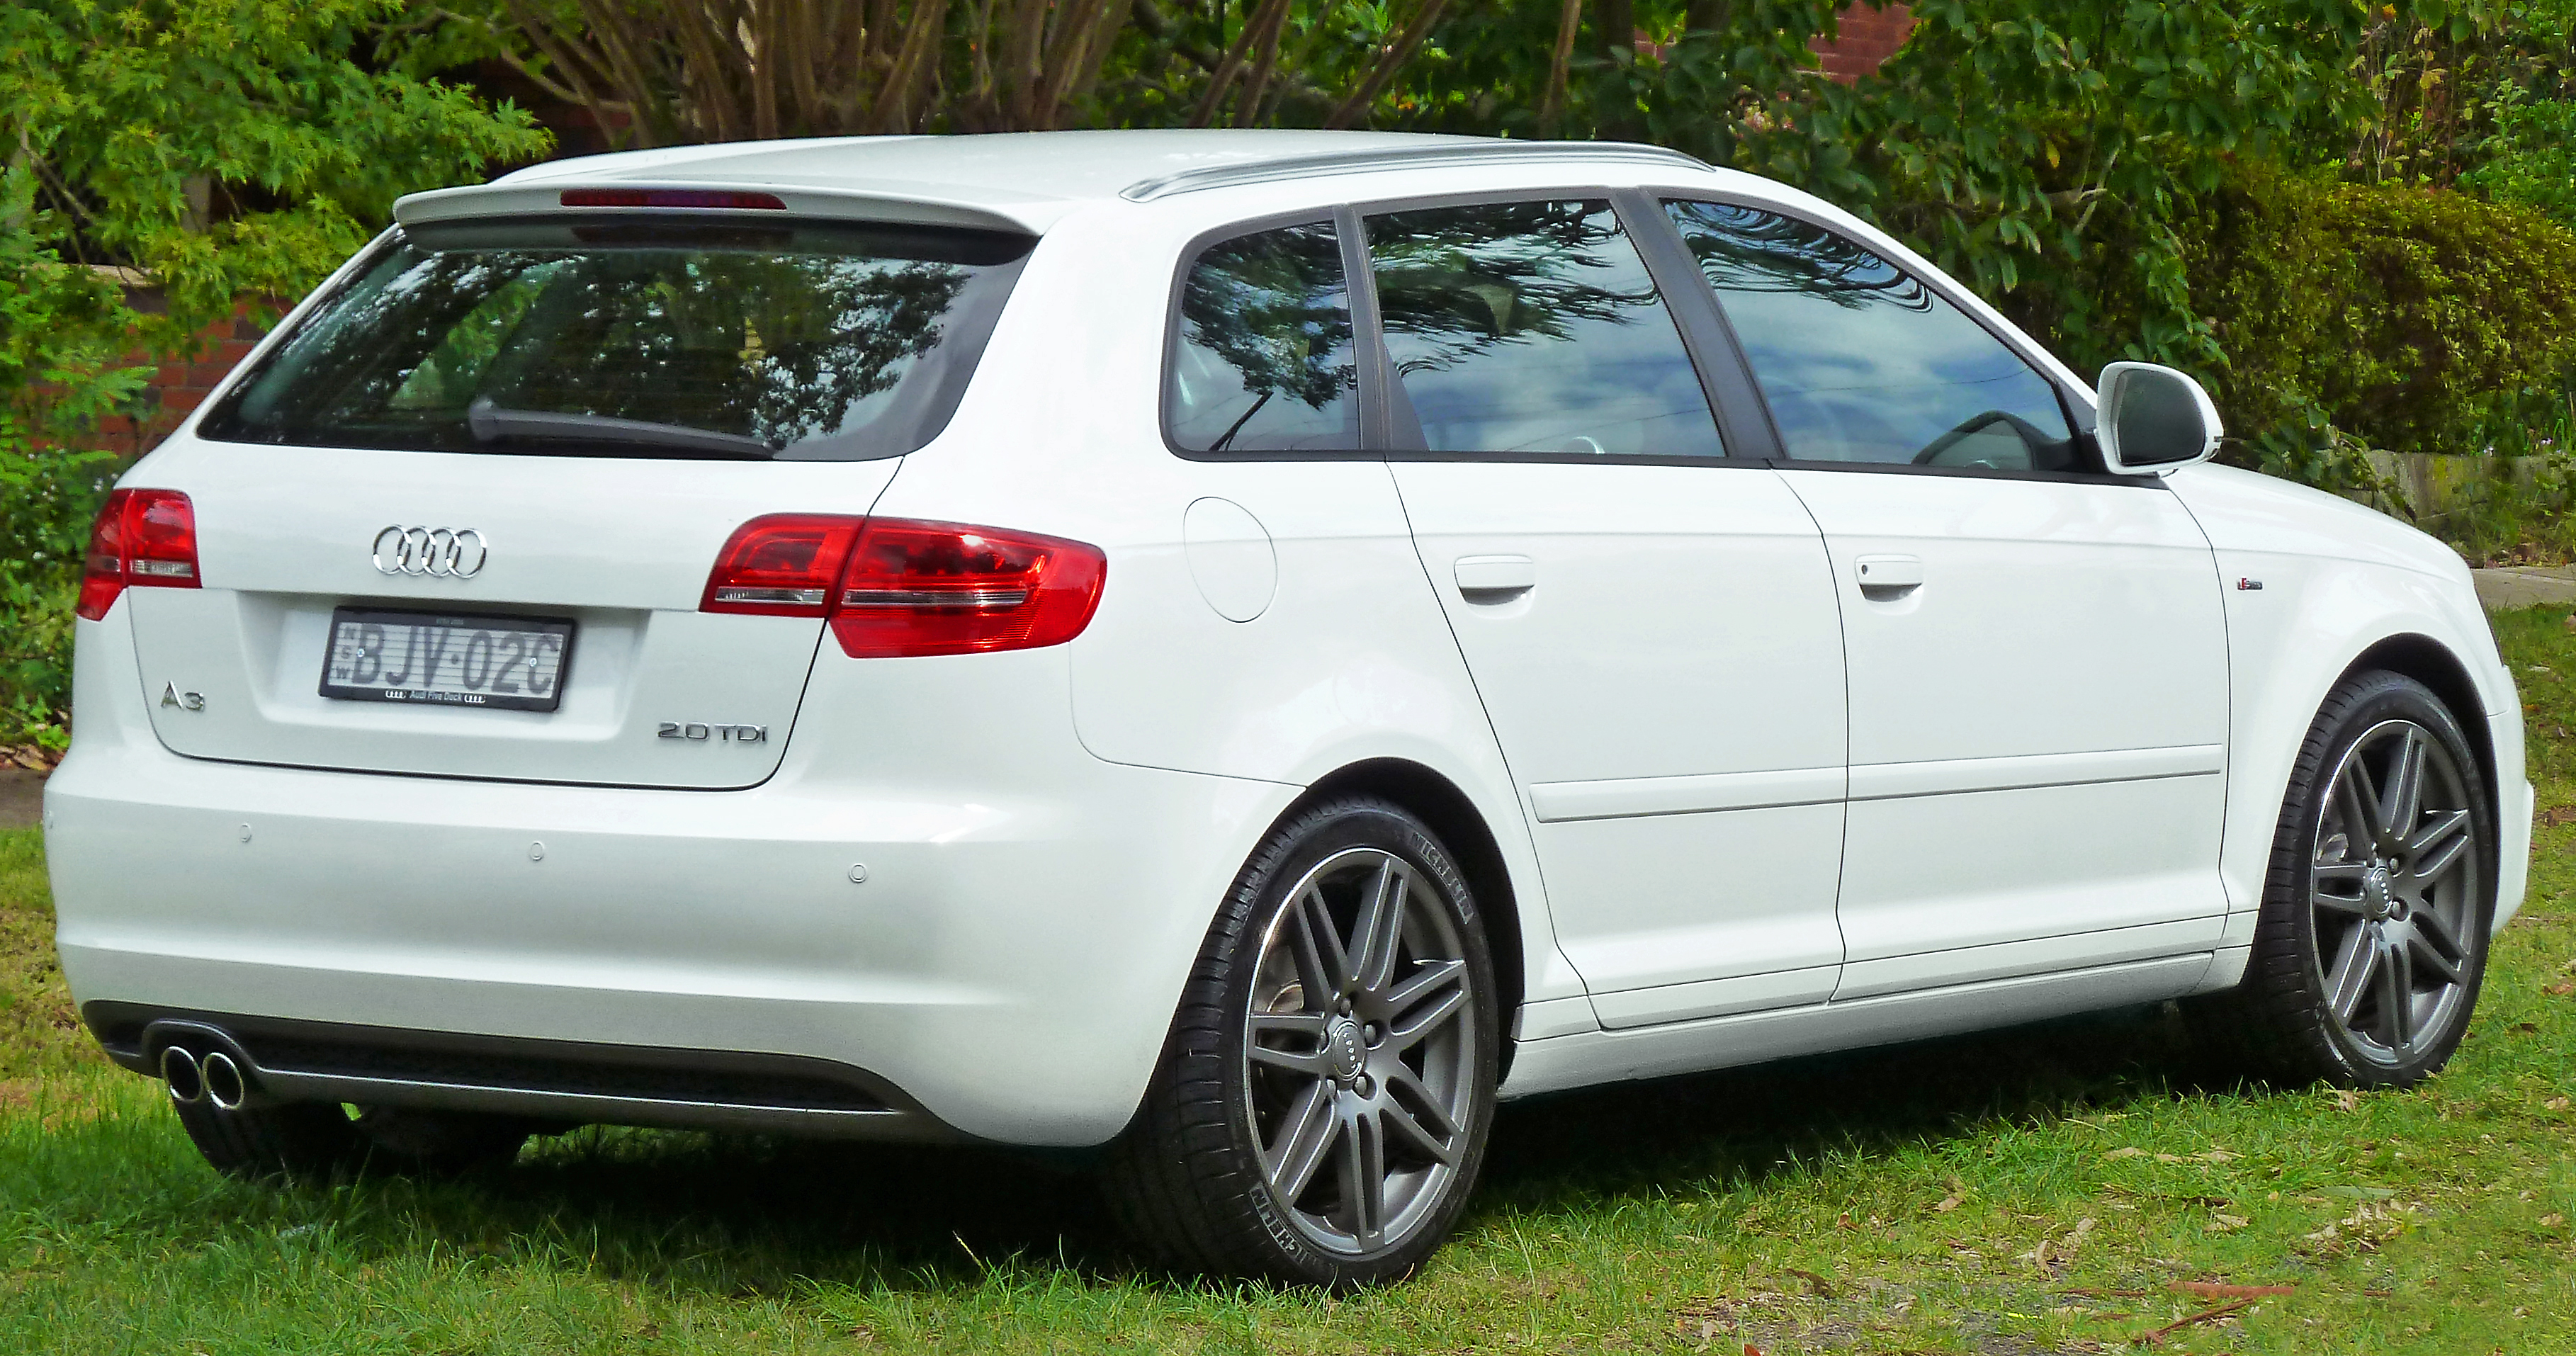 2011 Audi A3 Image 12